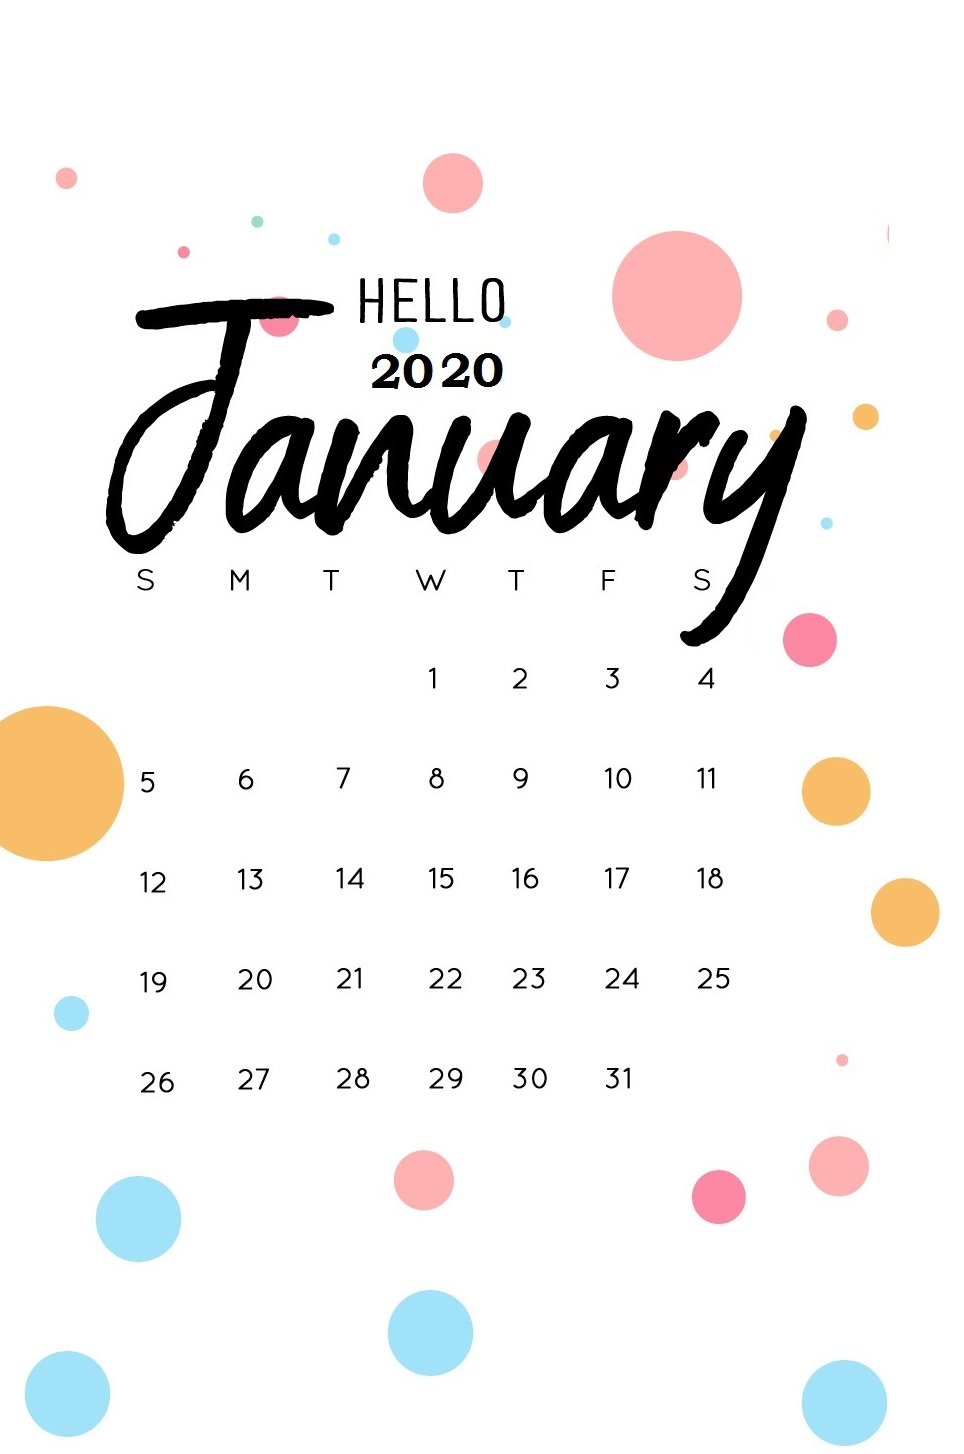 download iPhone January 2020 Wallpaper Calendar Latest 964x1454